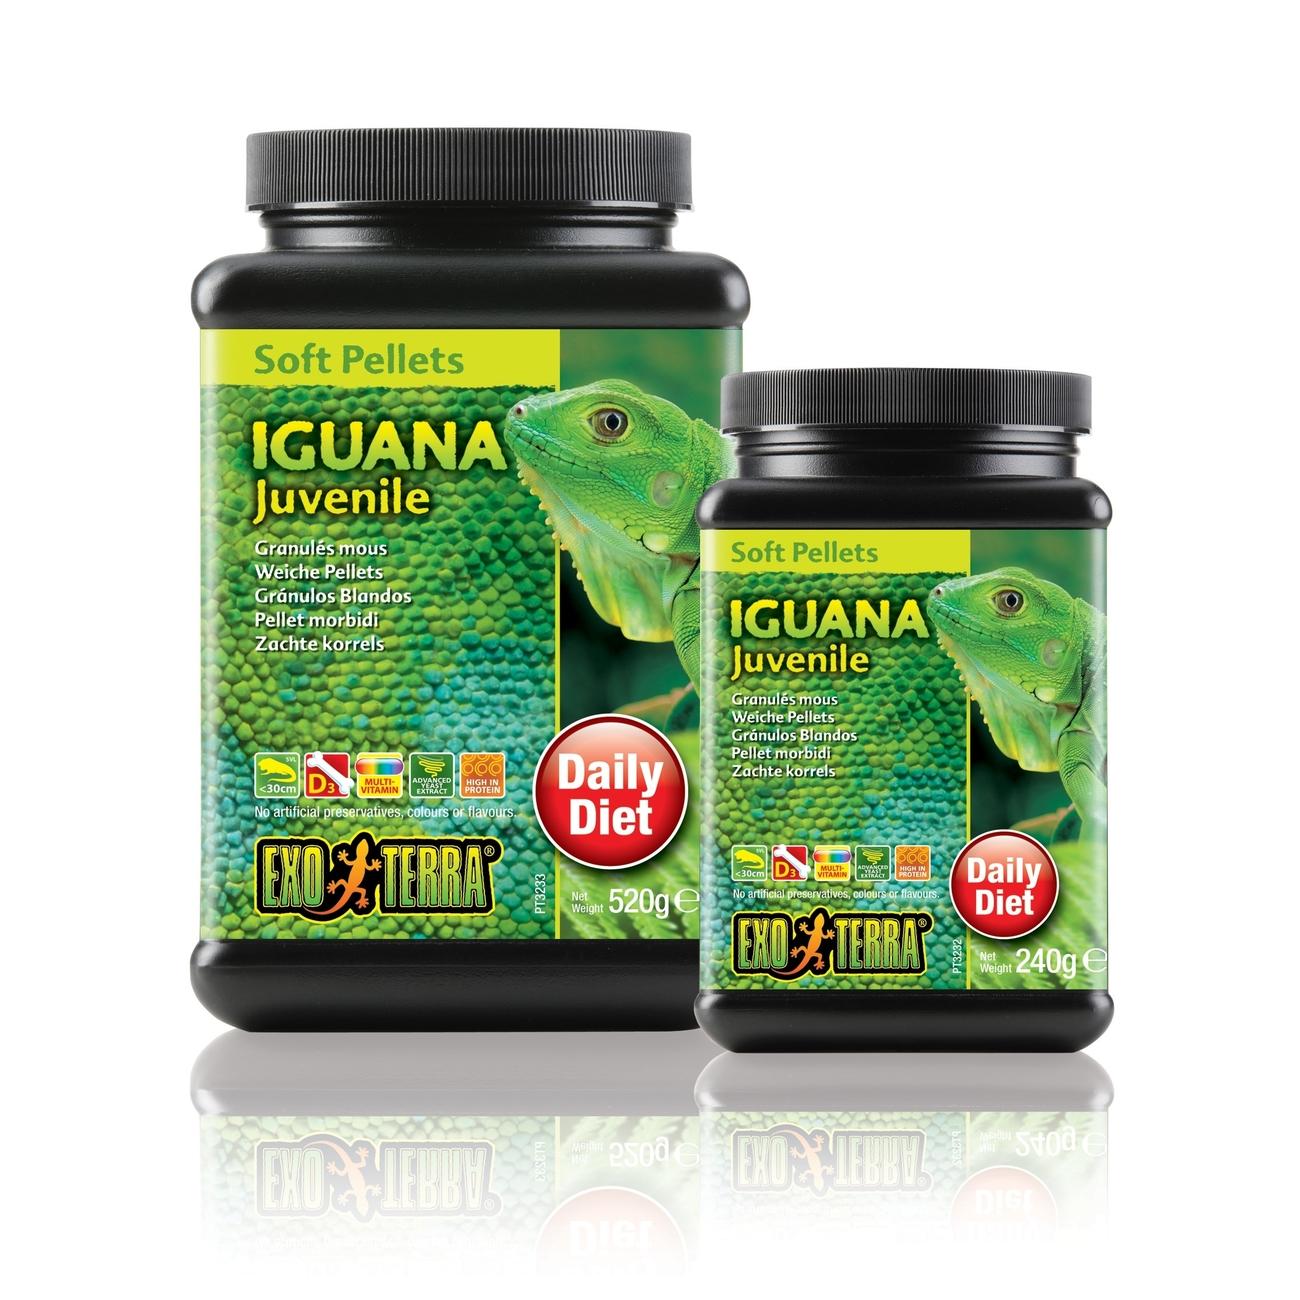 Hagen Exo Terra Futter - Soft Pellets für Leguane, Junior 520 g